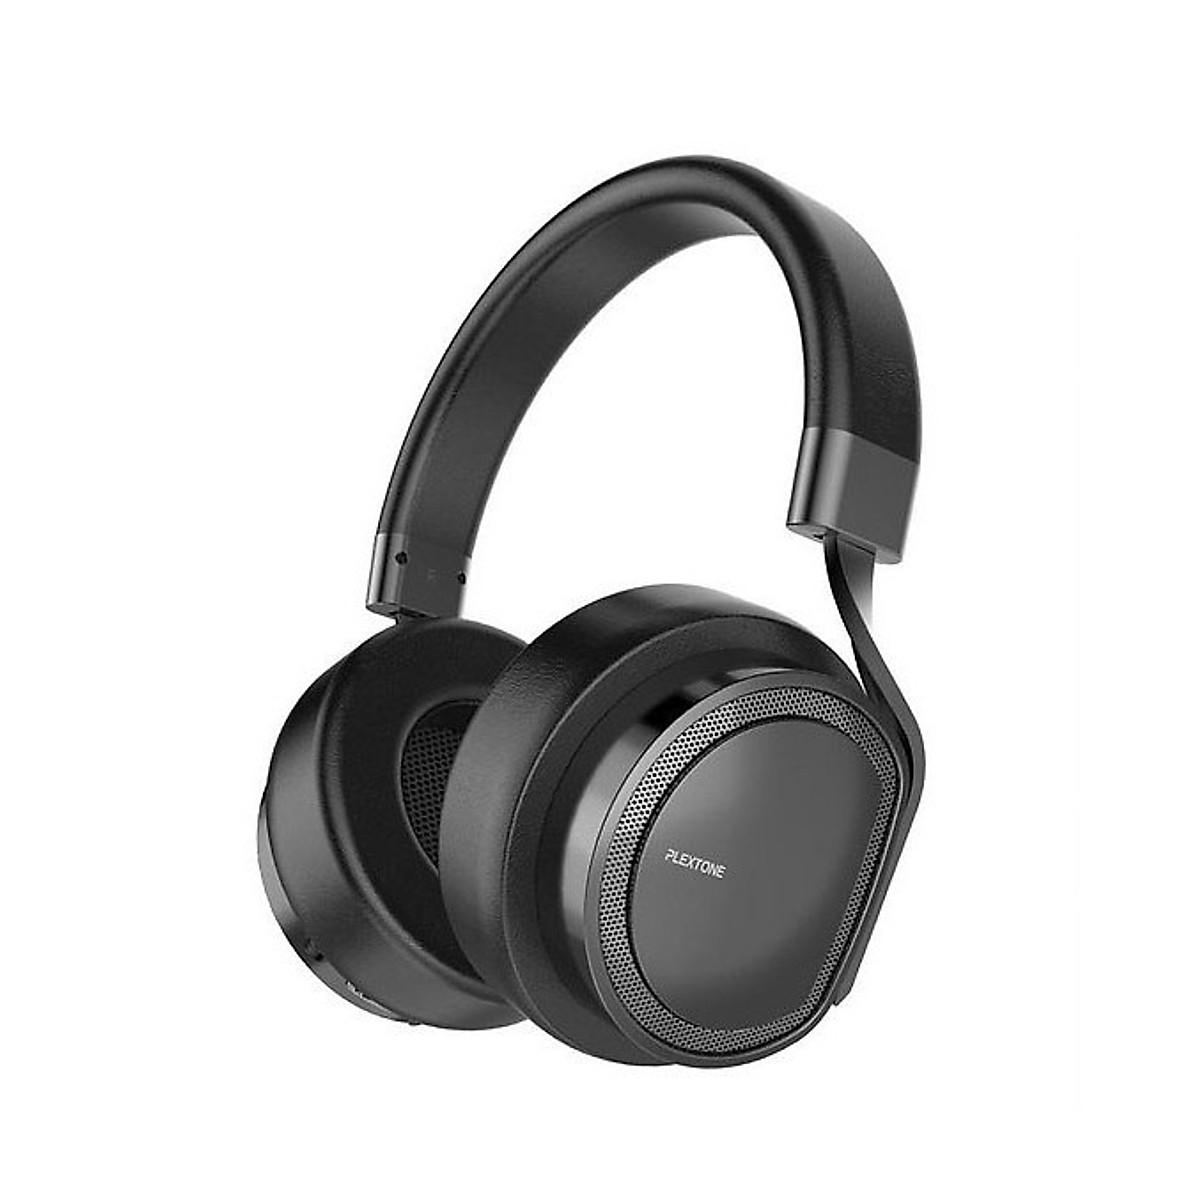 Plextone Bt270 Wireless Bluetooth Headphones